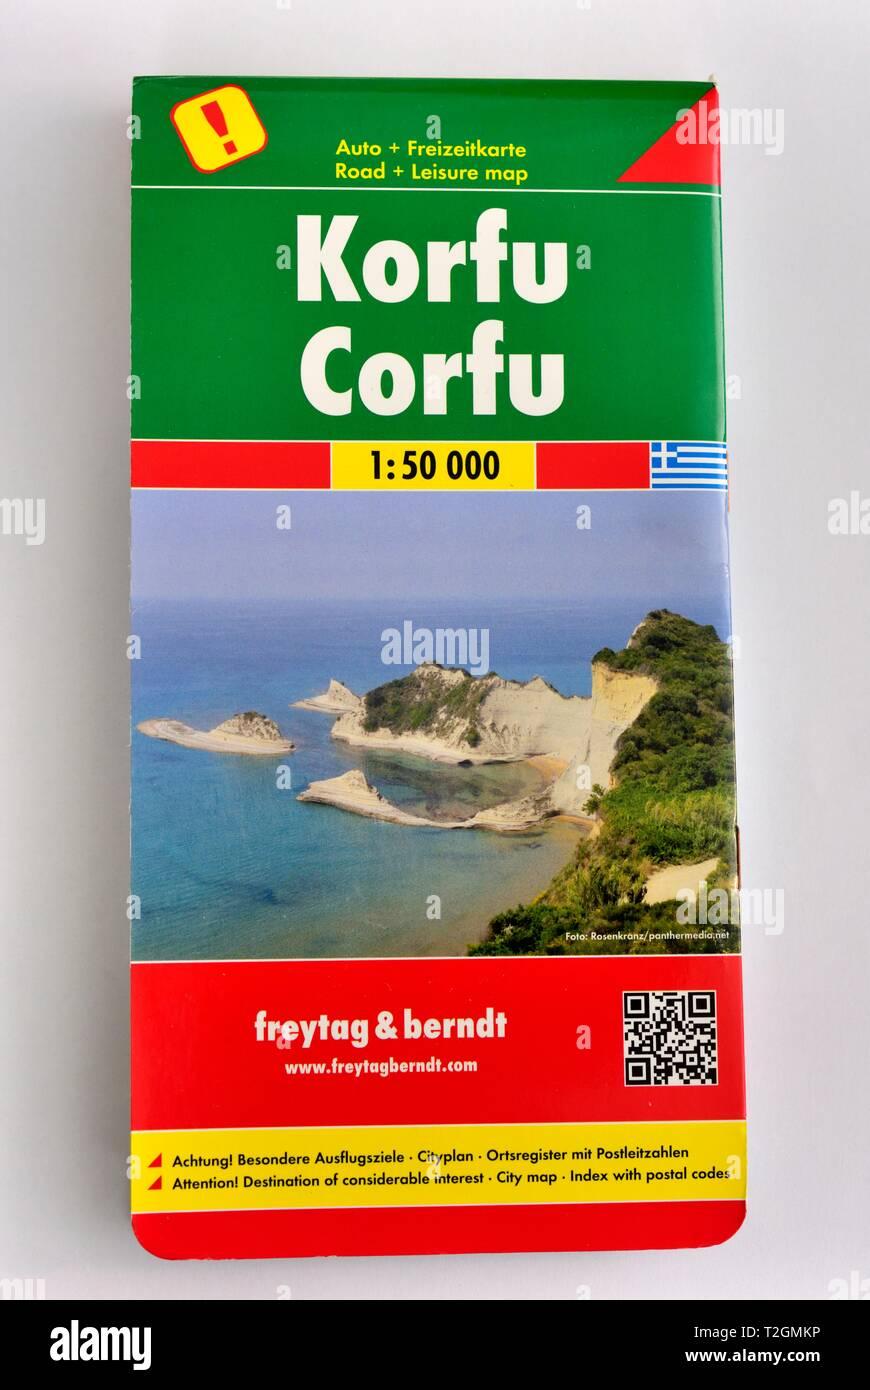 Korfu,Corfu,road leisure map,Freytag&Berndt, - Stock Image